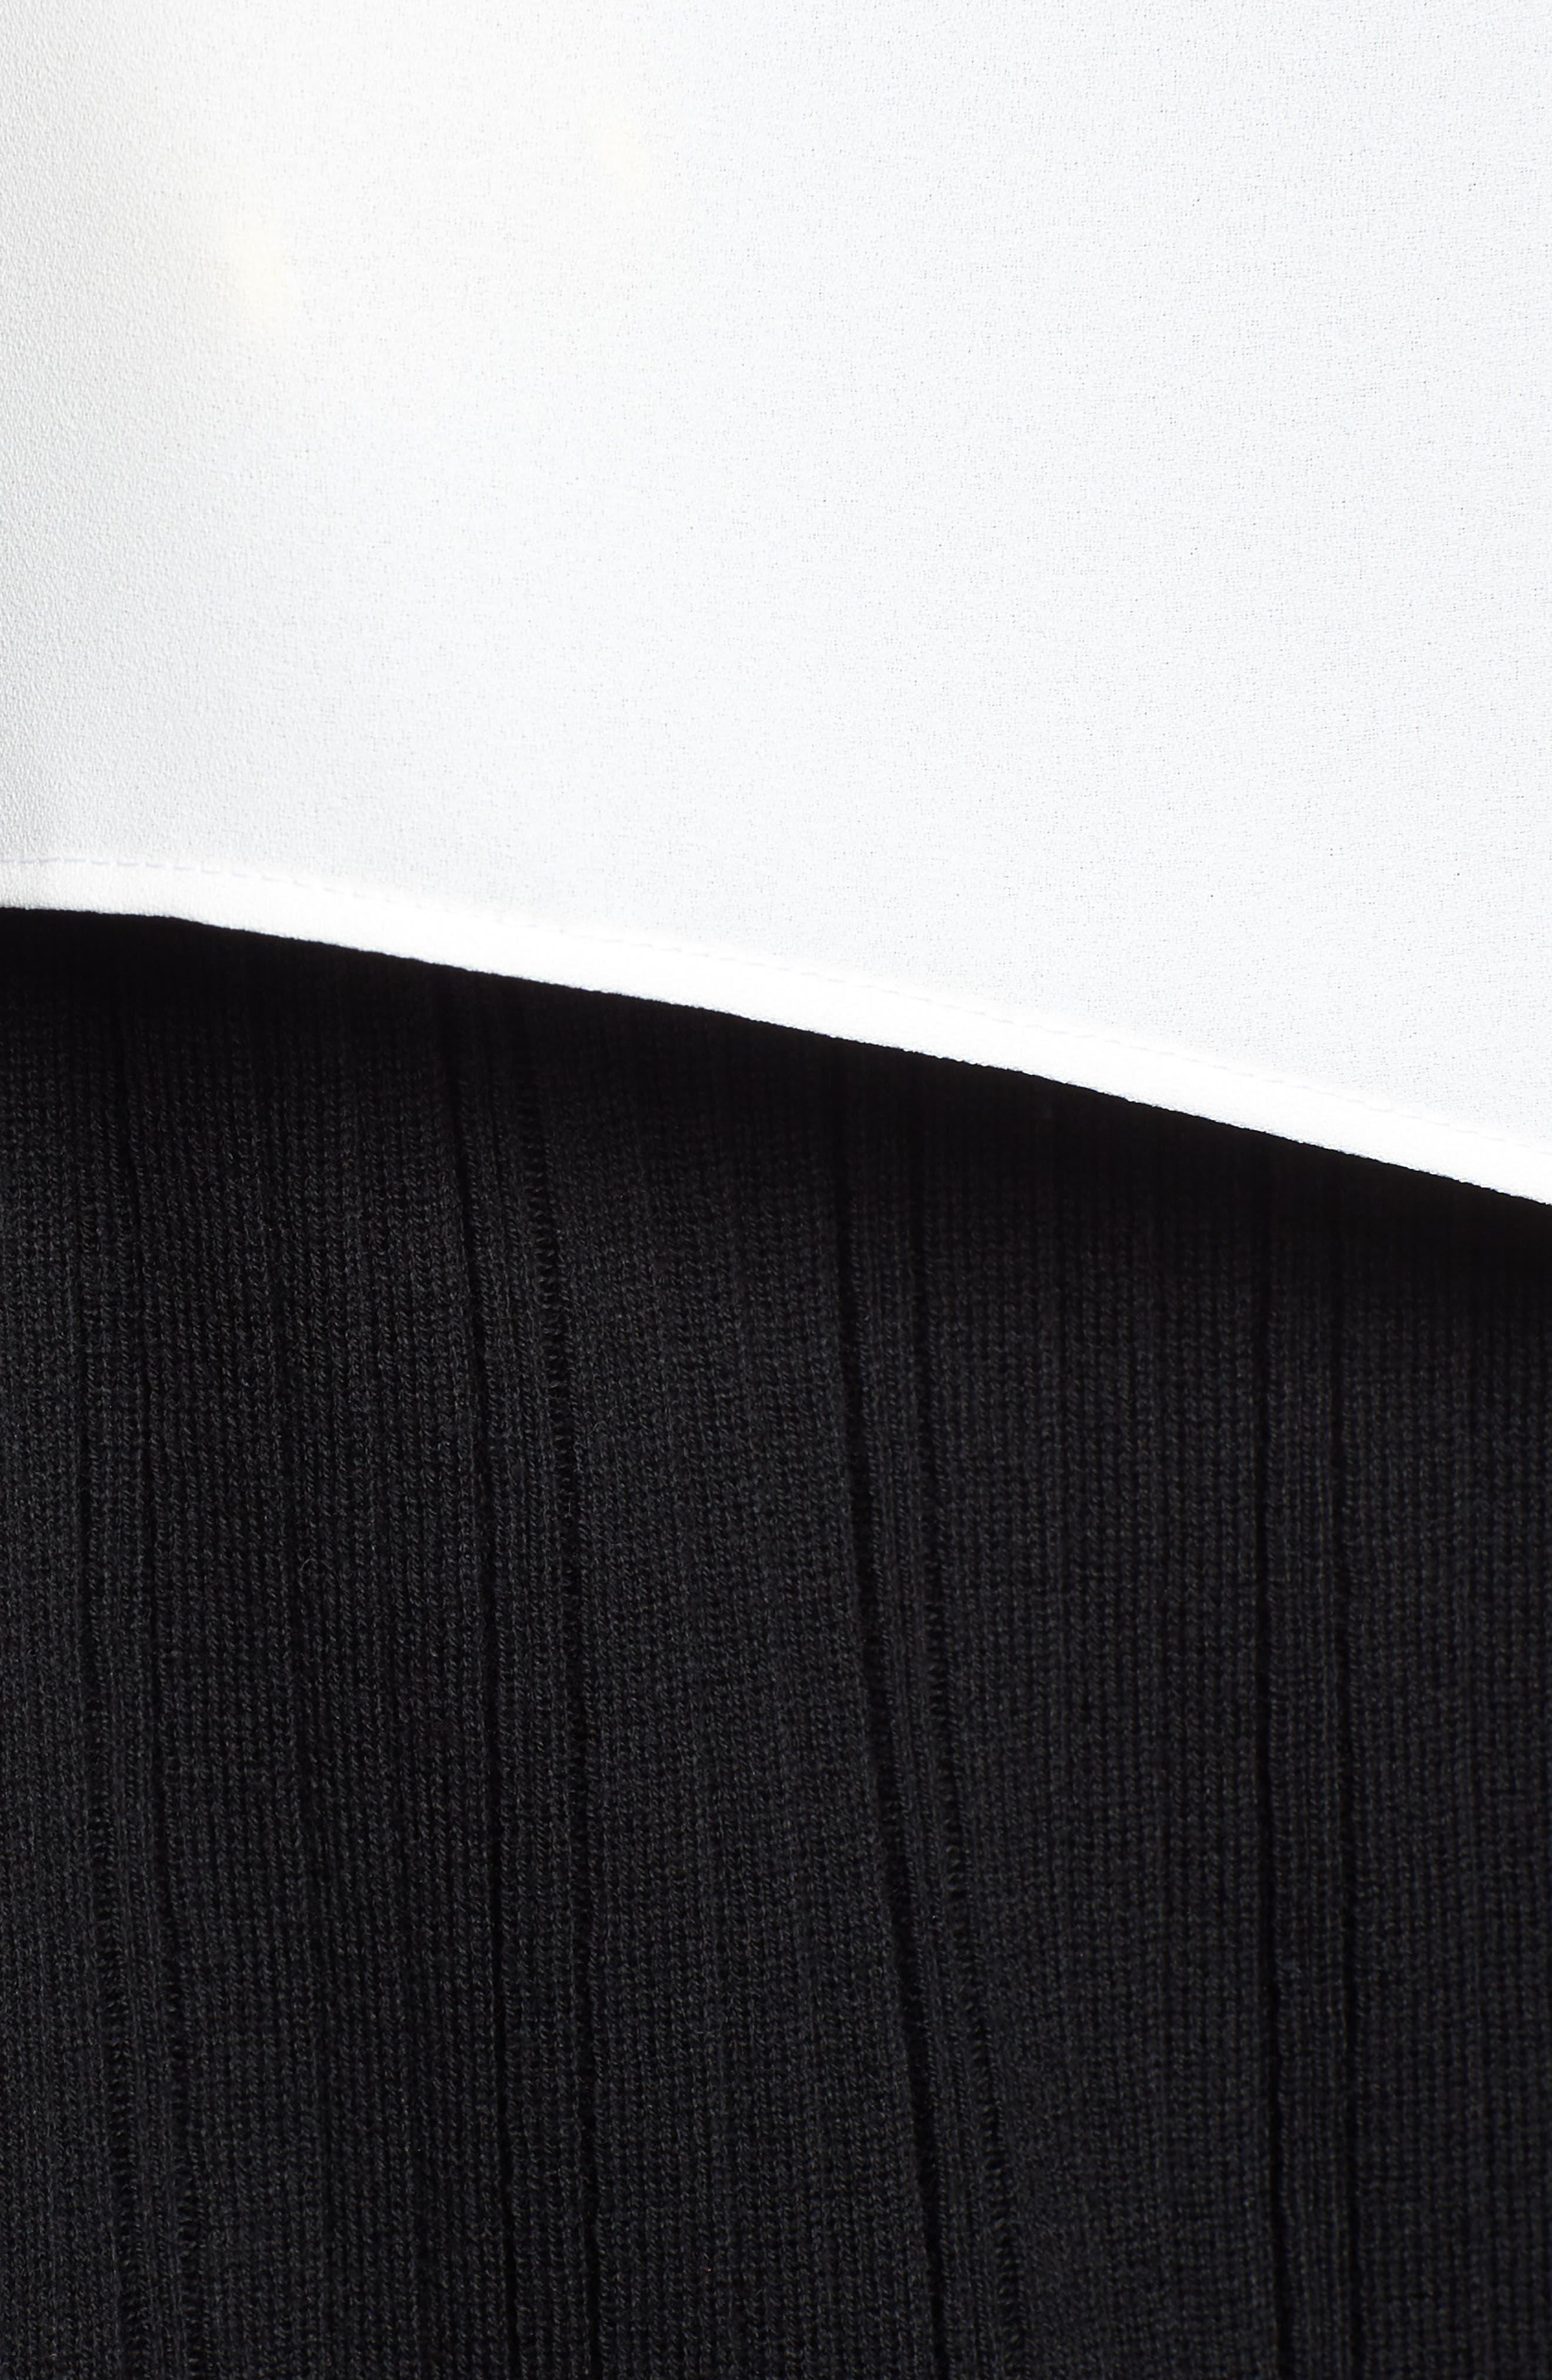 Mixed Media Short Sleeve Tunic Top,                             Alternate thumbnail 5, color,                             WHITE/ BLACK